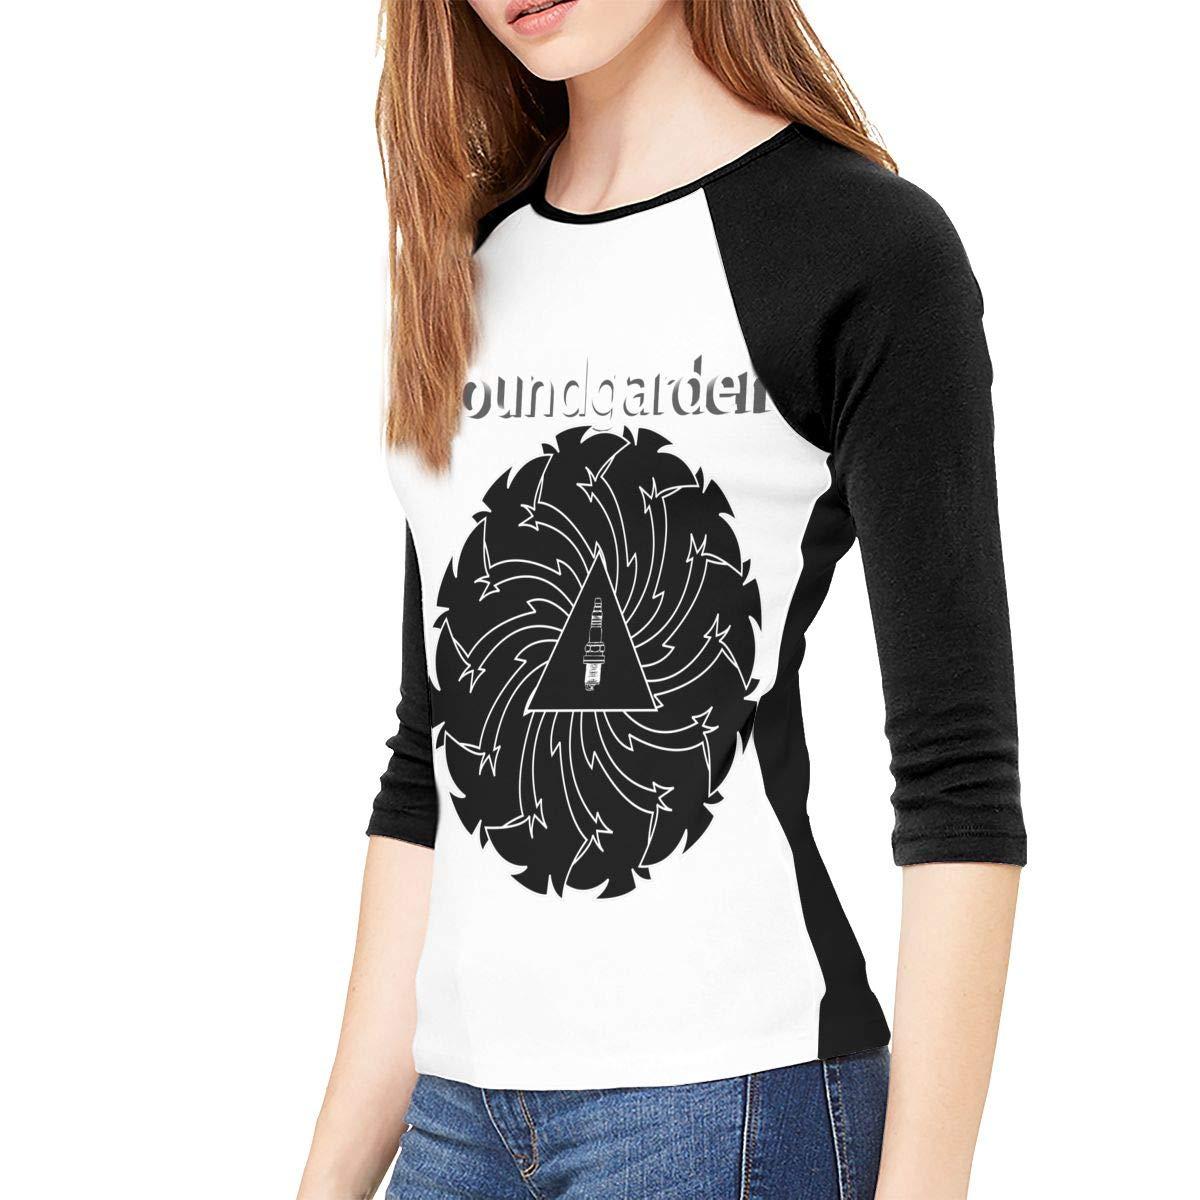 FankTasf Soundgarden Female Slim 3//4 Sleeve Casual Fashion Round Neck Top T-Shirt